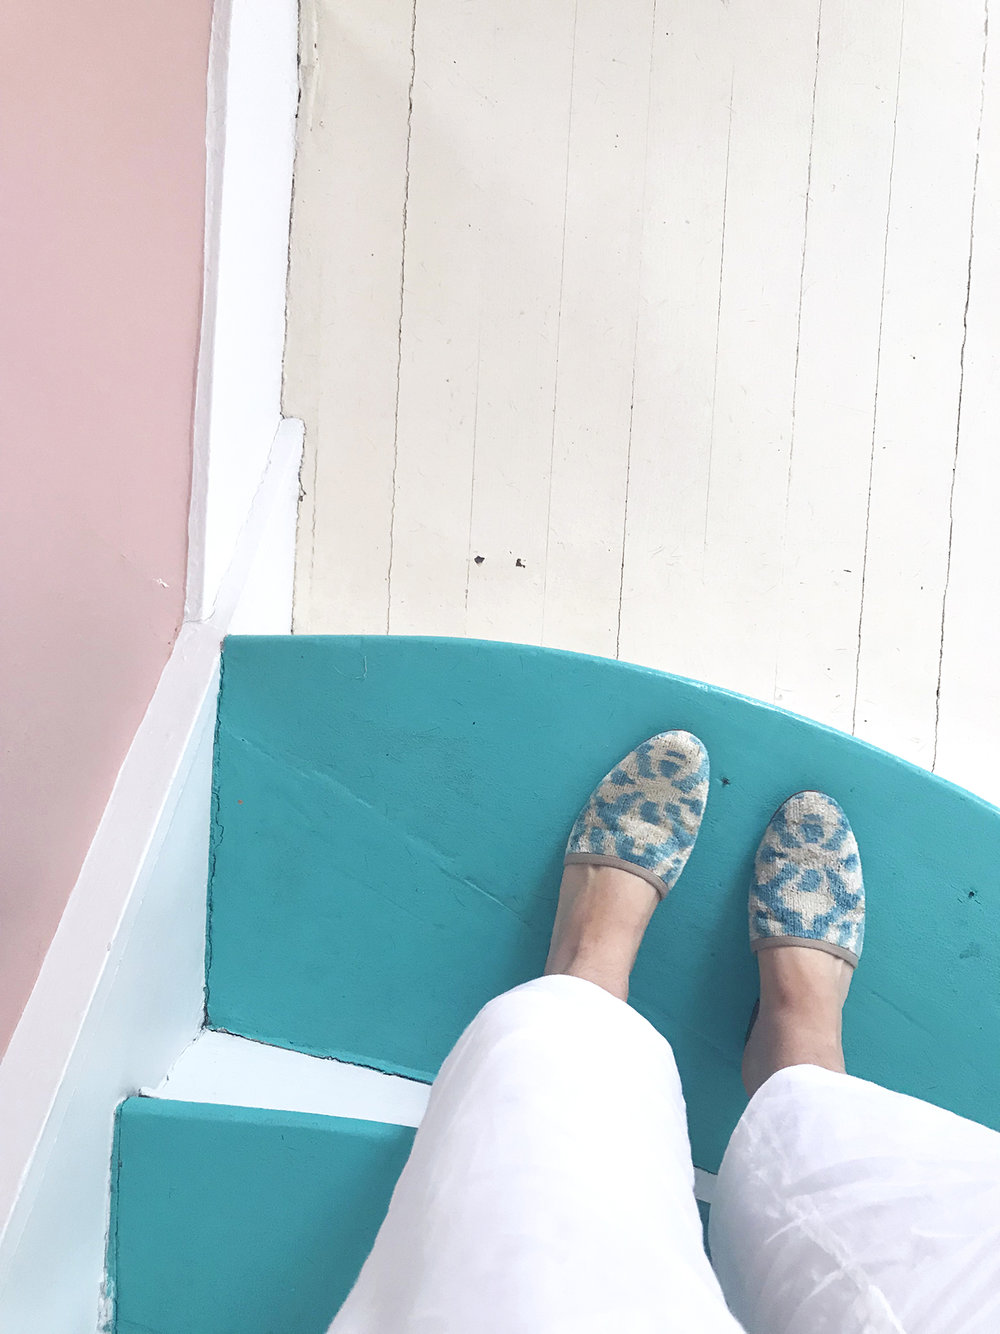 Carson velvet slides or velvet mules on the teal stairs in Provincetown, MA.